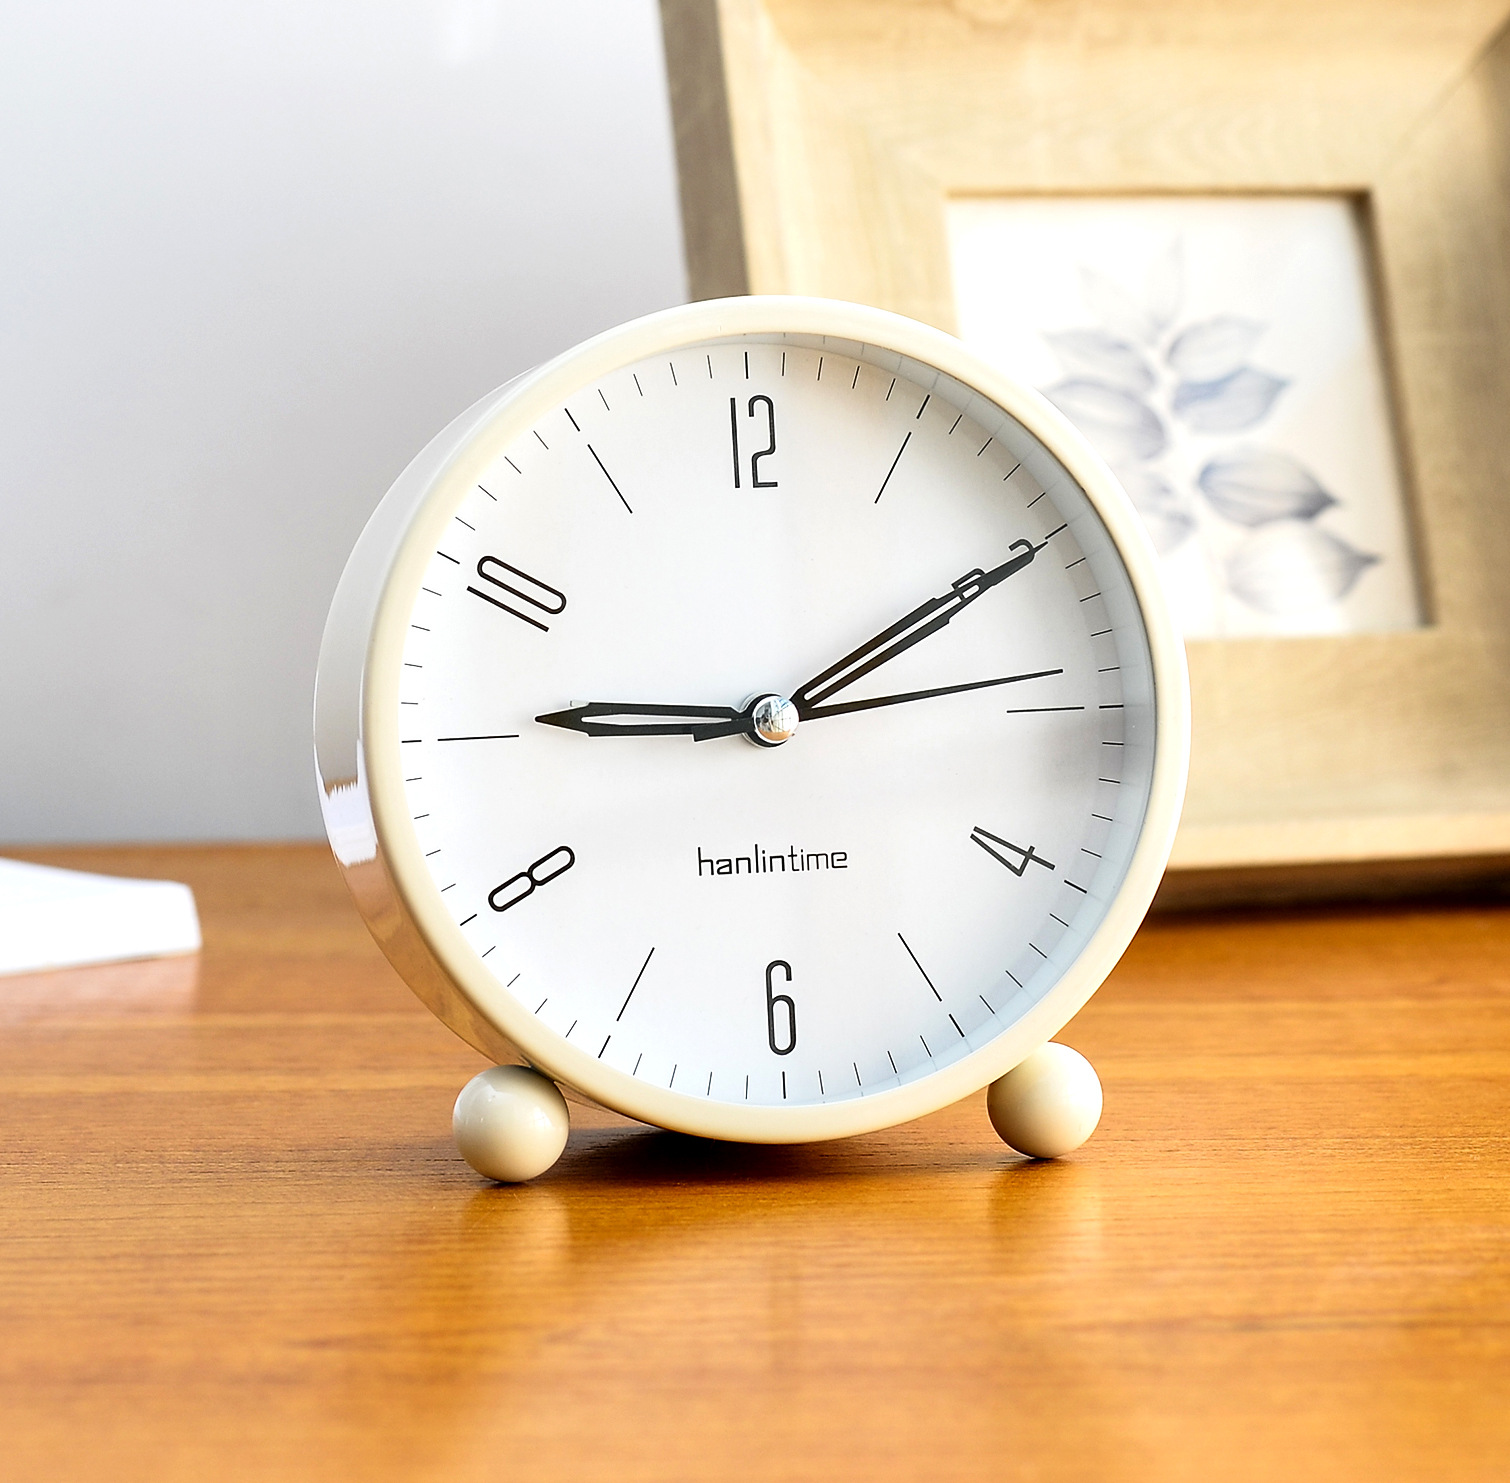 Kids alarm clock modern design decorative children room mini metal table clocks with nightlight desk watch silent 5 inch in alarm clocks from home garden